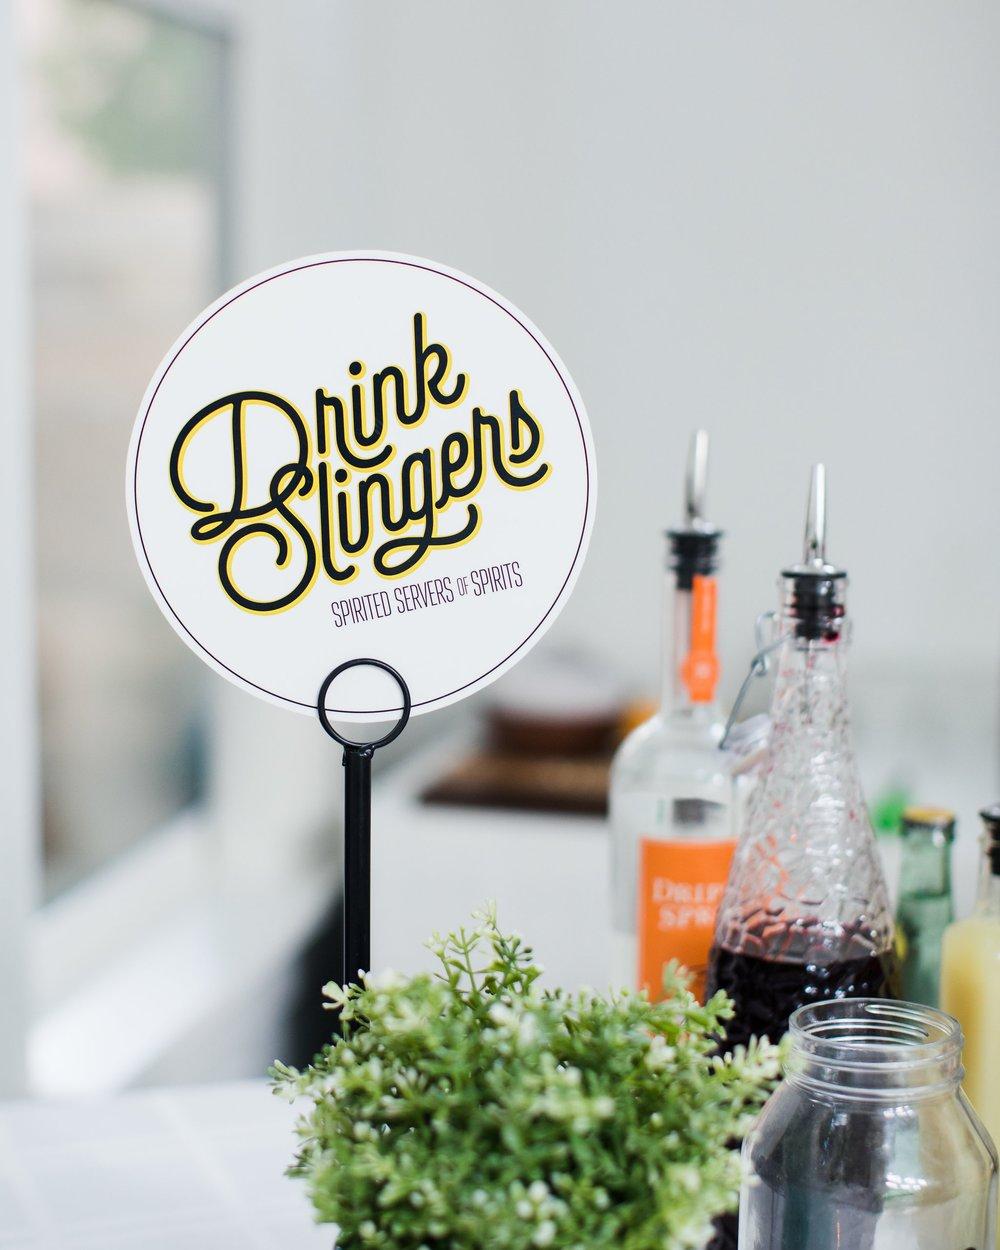 austin-event-bartender-standard-slinger-image-2.jpg